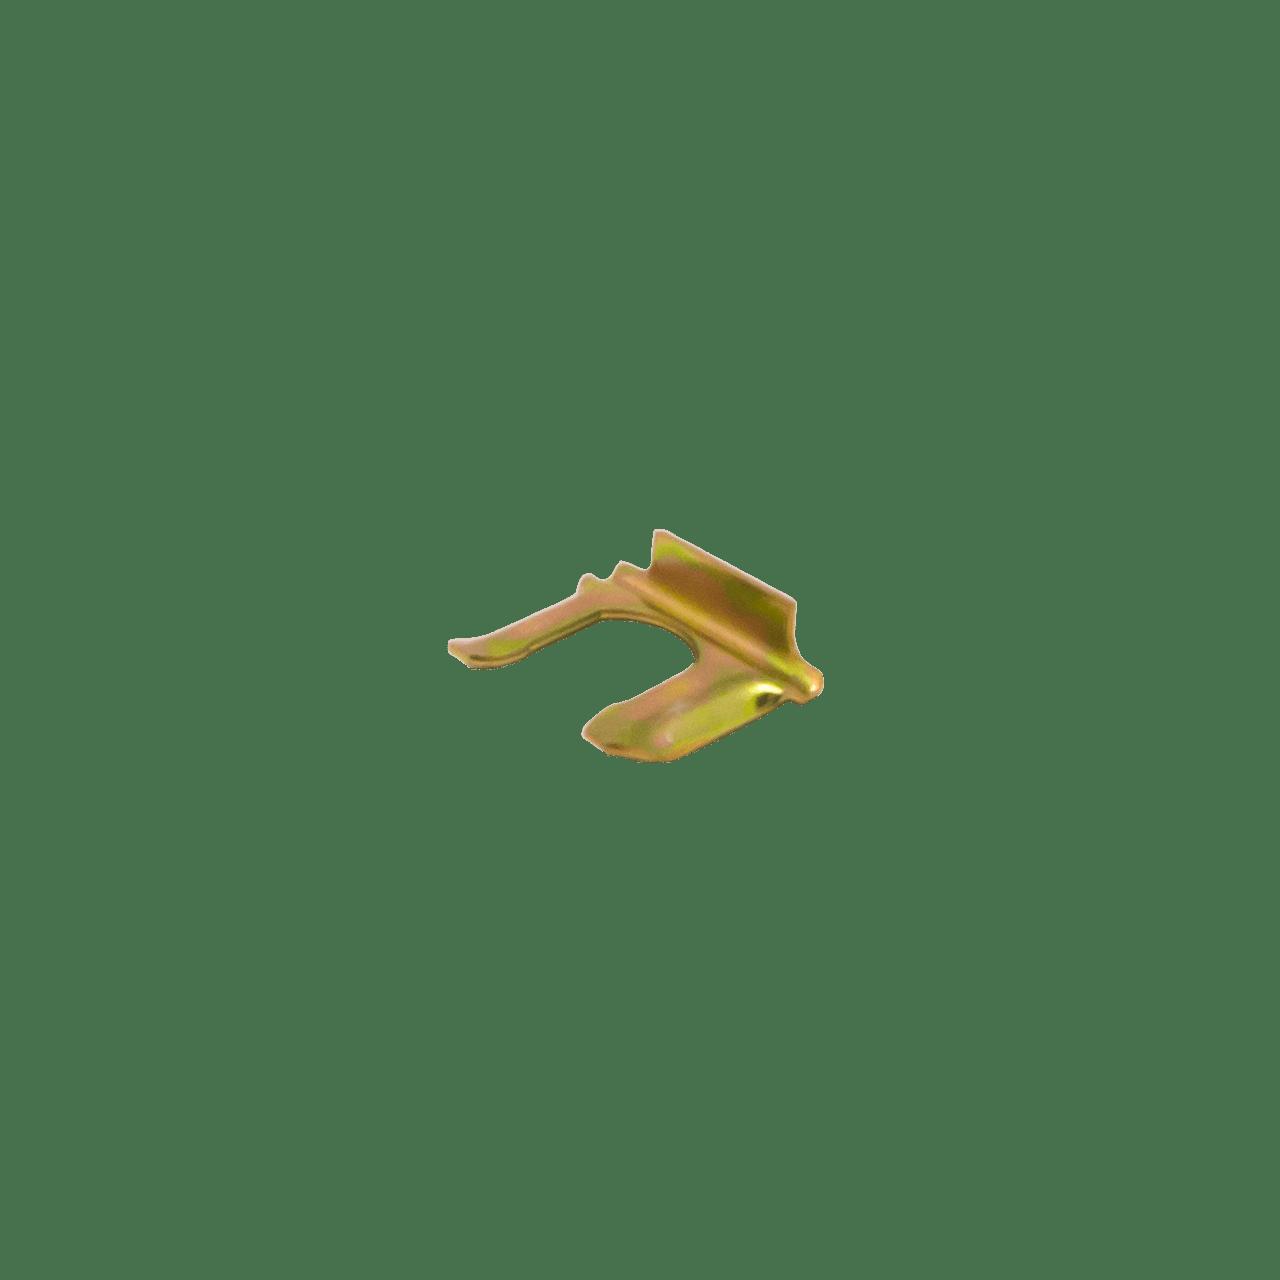 SB7764 --- Retainer Clip for 05981-95